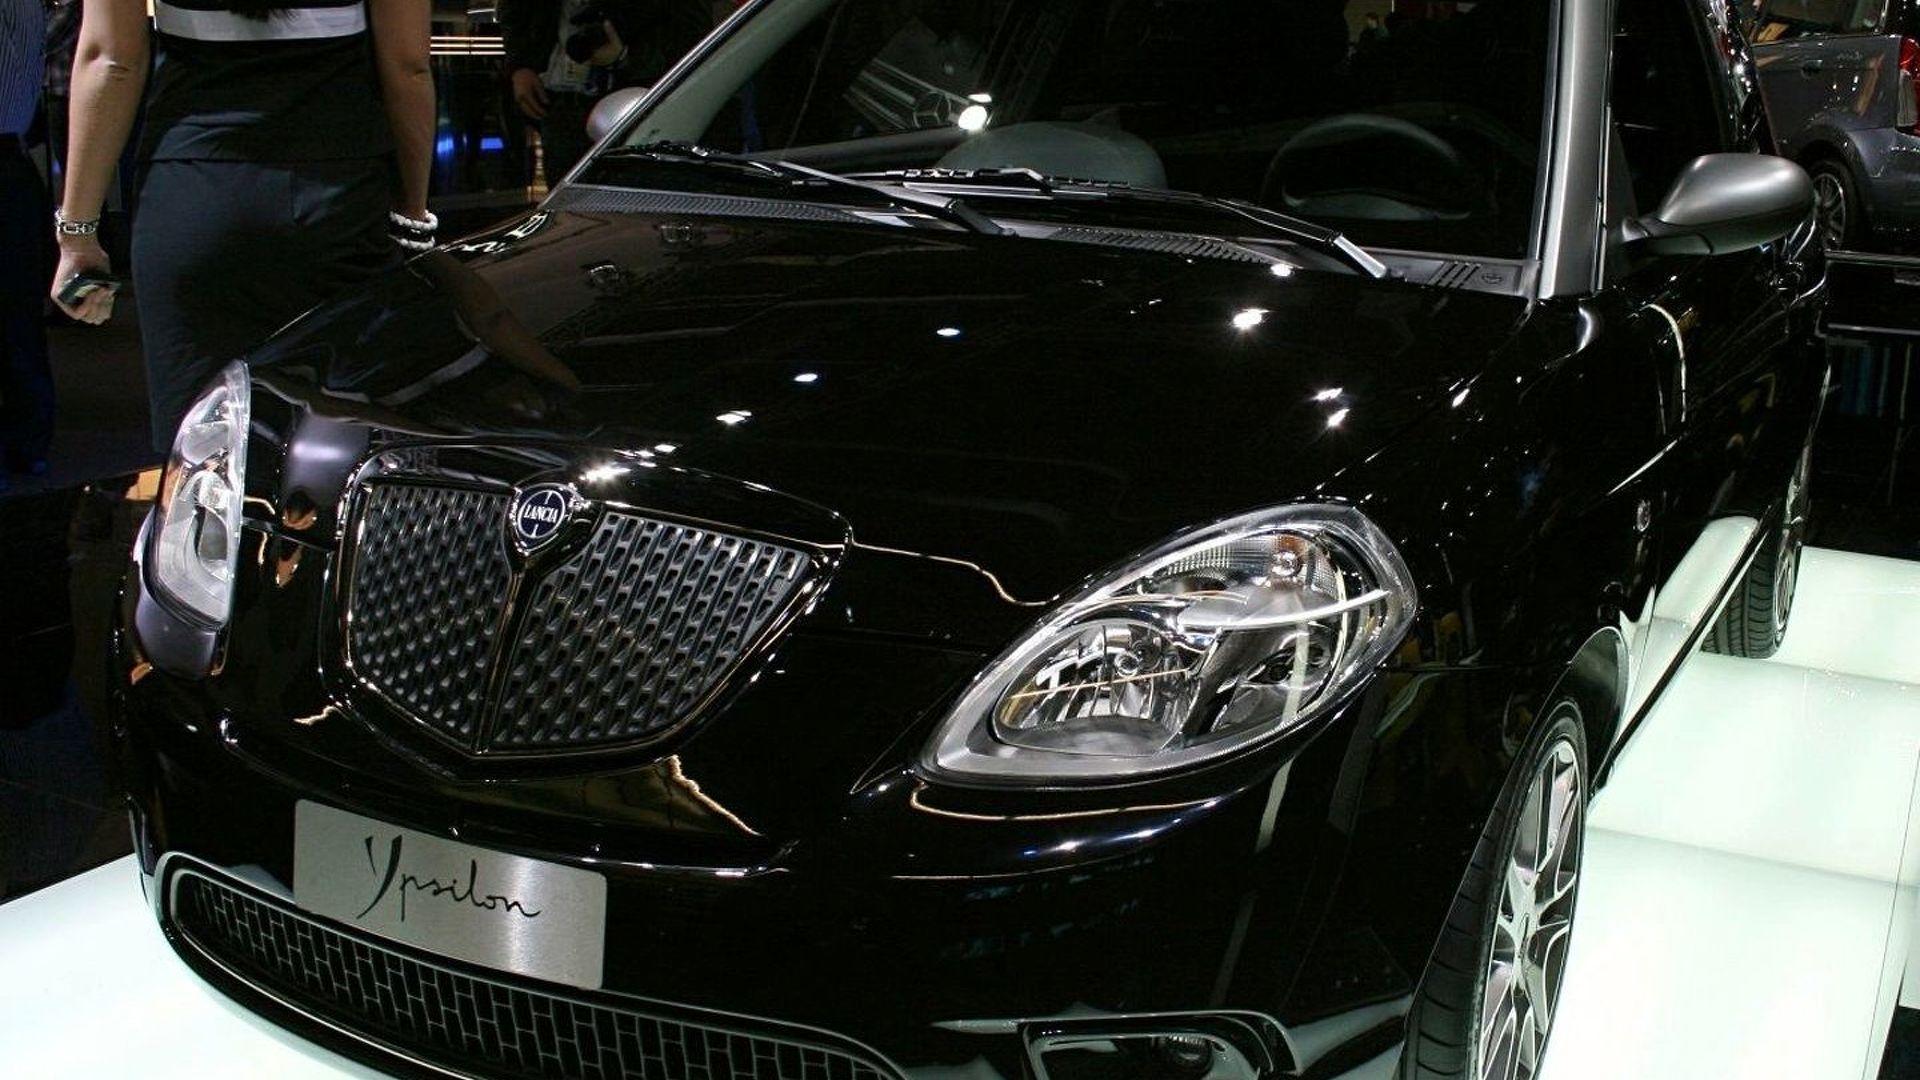 https://icdn-2.motor1.com/images/mgl/e02W/s1/2007-31223-exclusive-new-lancia-ypsilon-sport-momodesign1.jpg